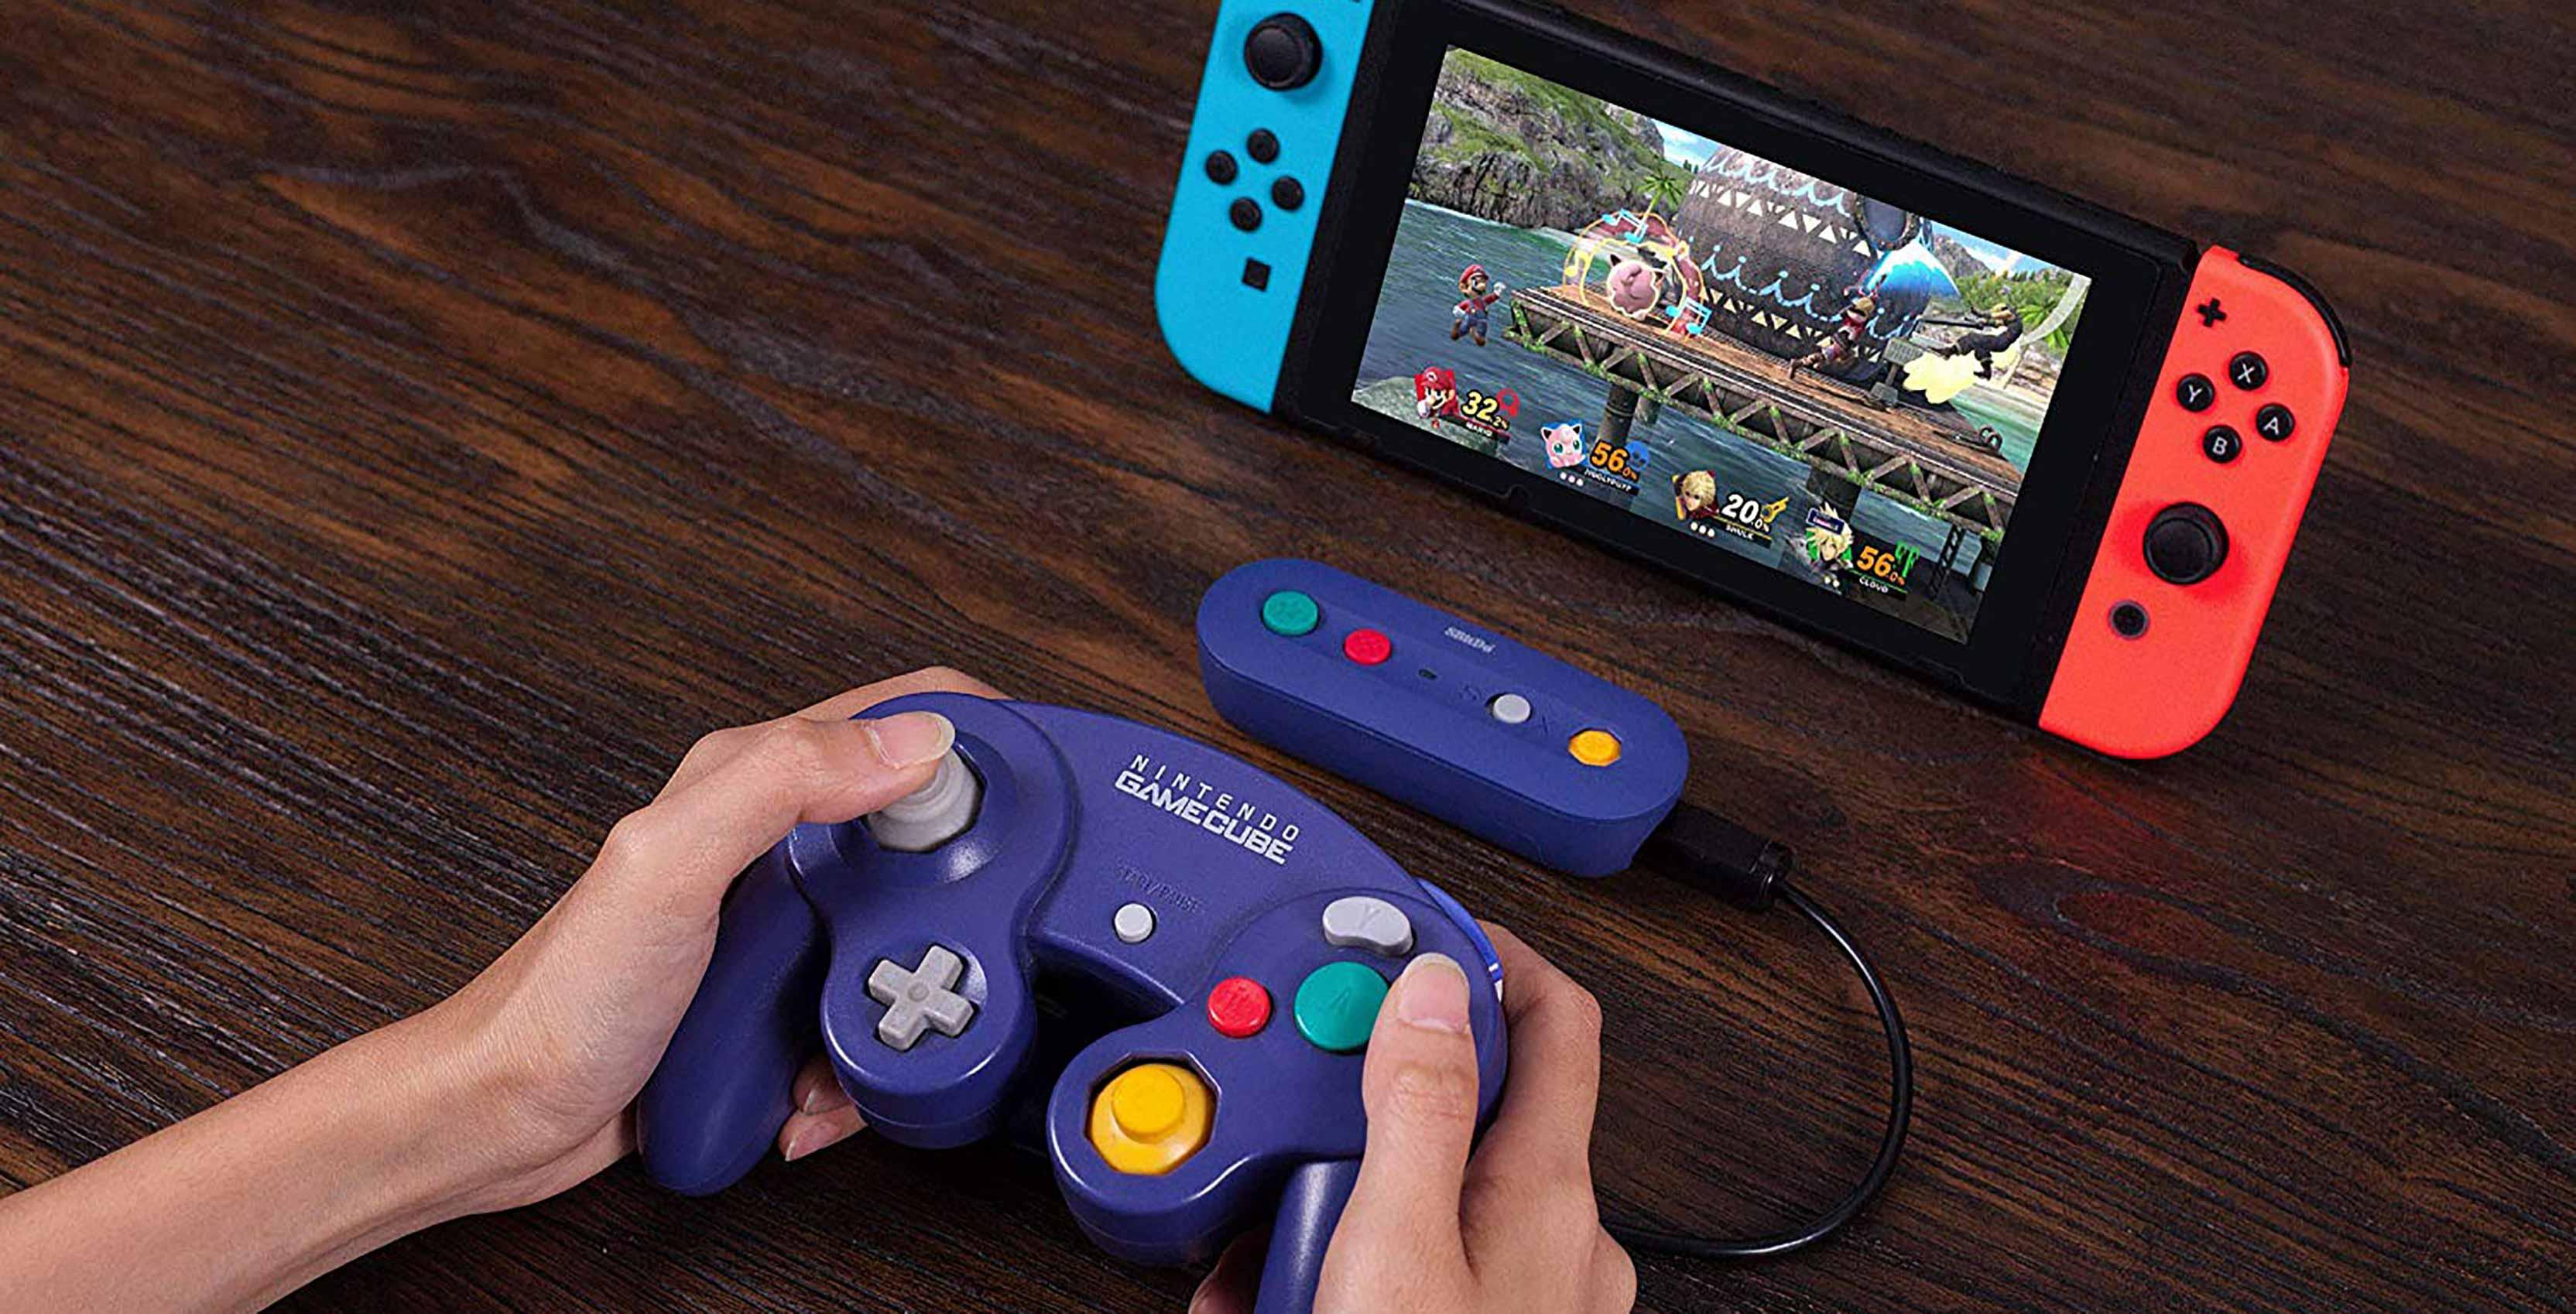 GBros. GameCube adapter